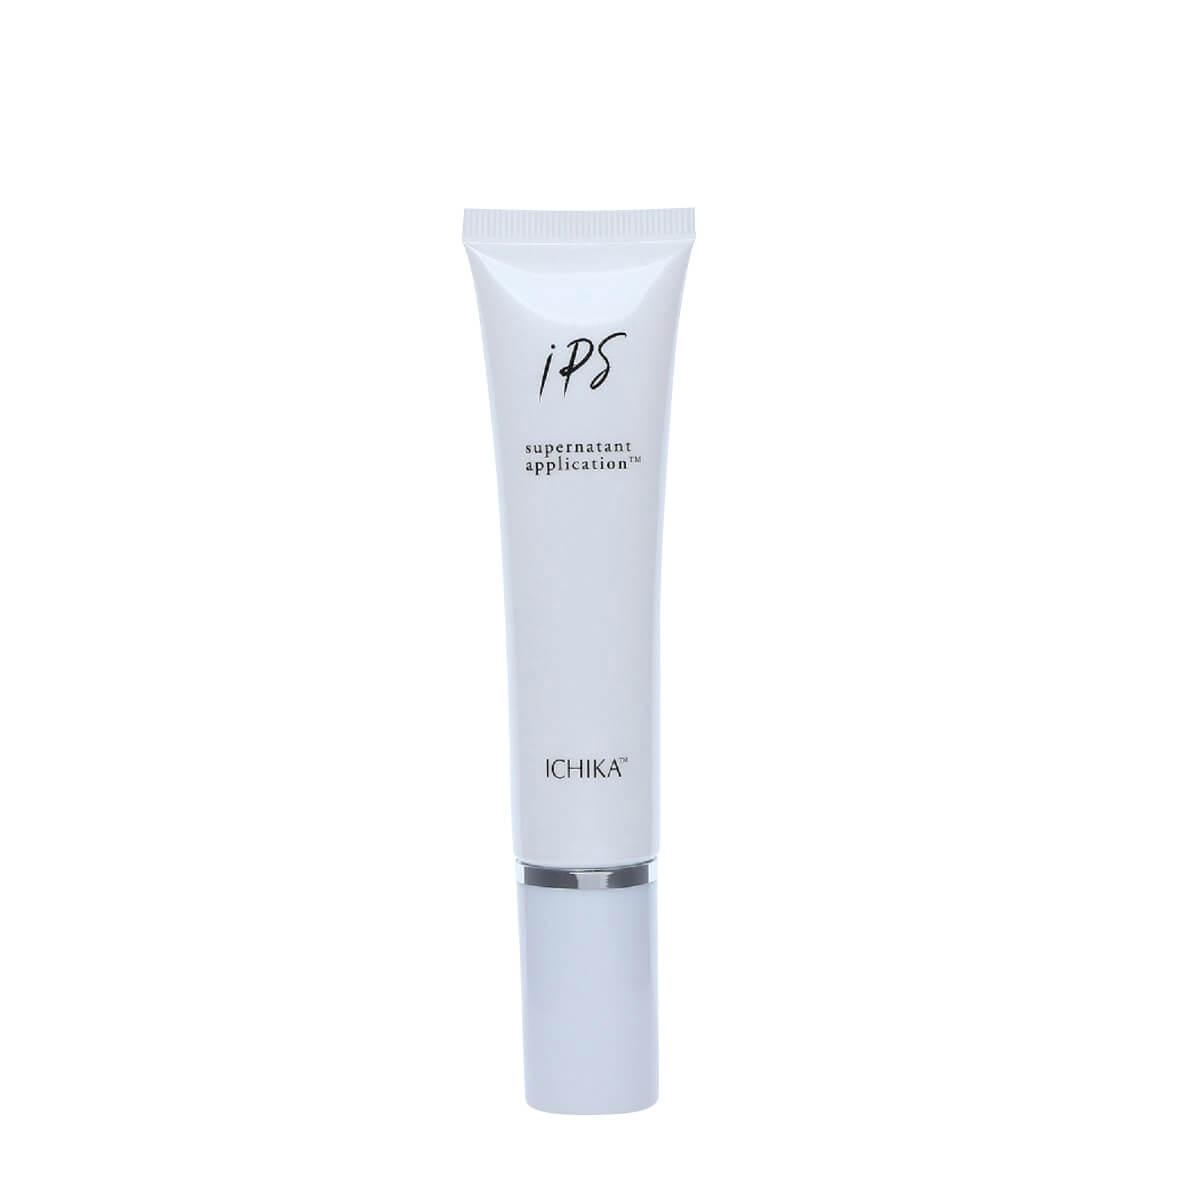 【ICHIKA化粧品】 iPS-SNA 美容クリーム〈5%〉【40ml】